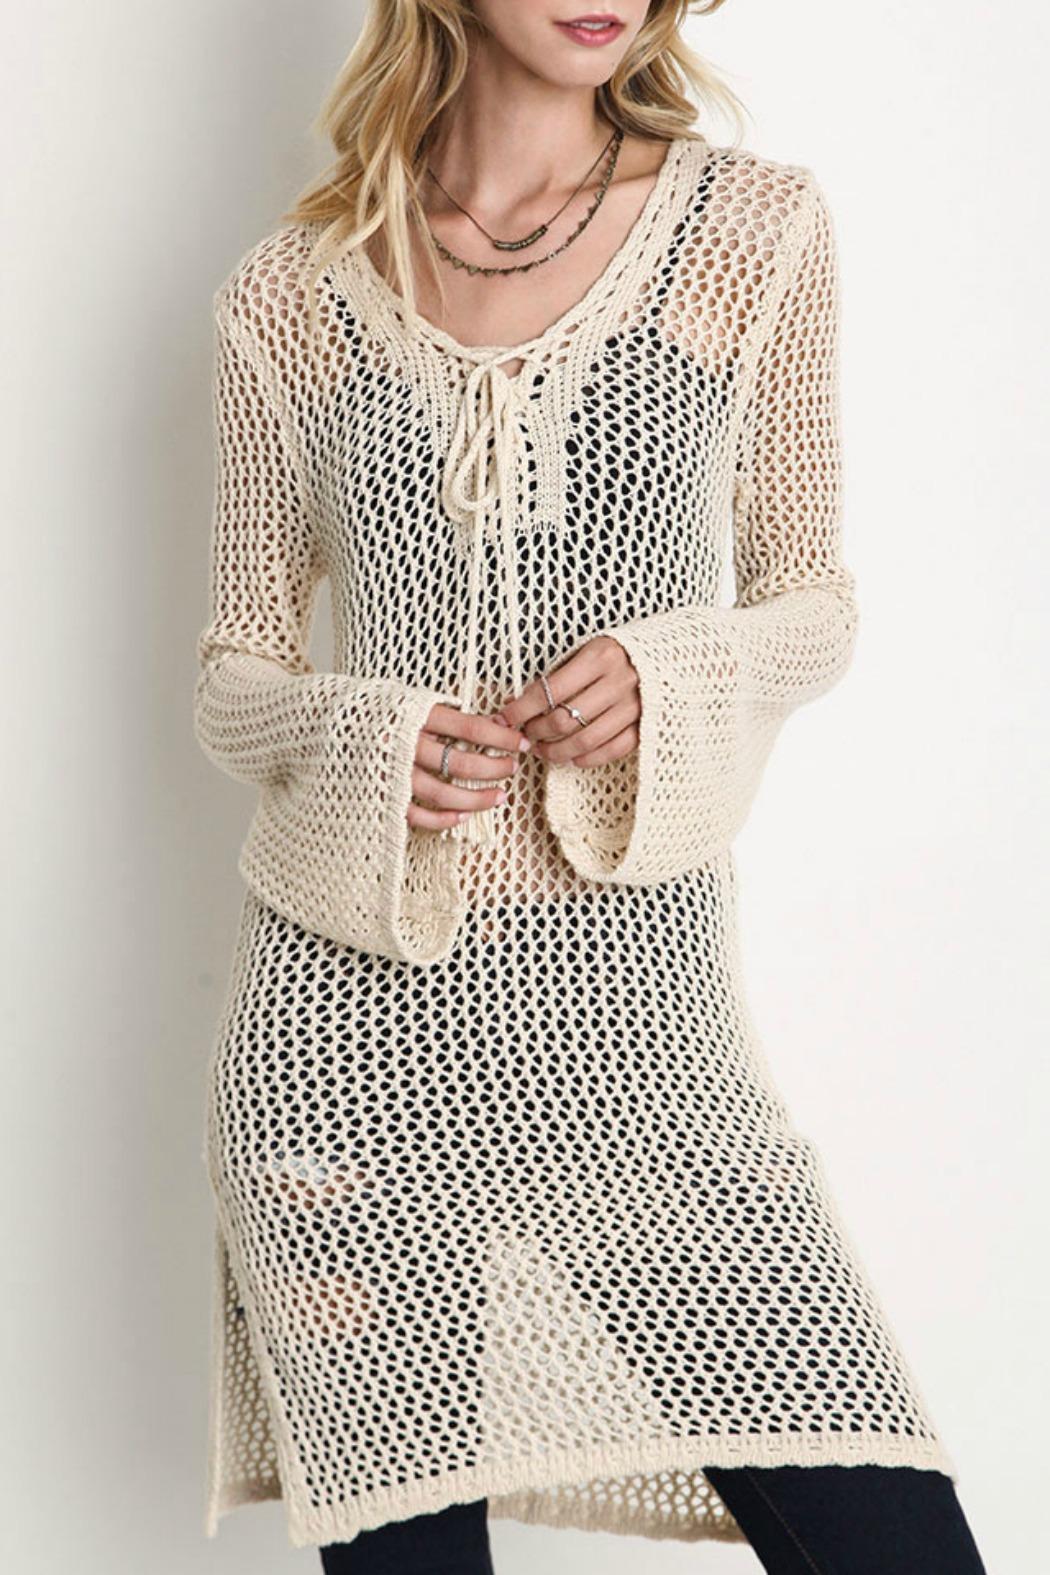 umgee usa sheer crochet tunic - main image deszpgf